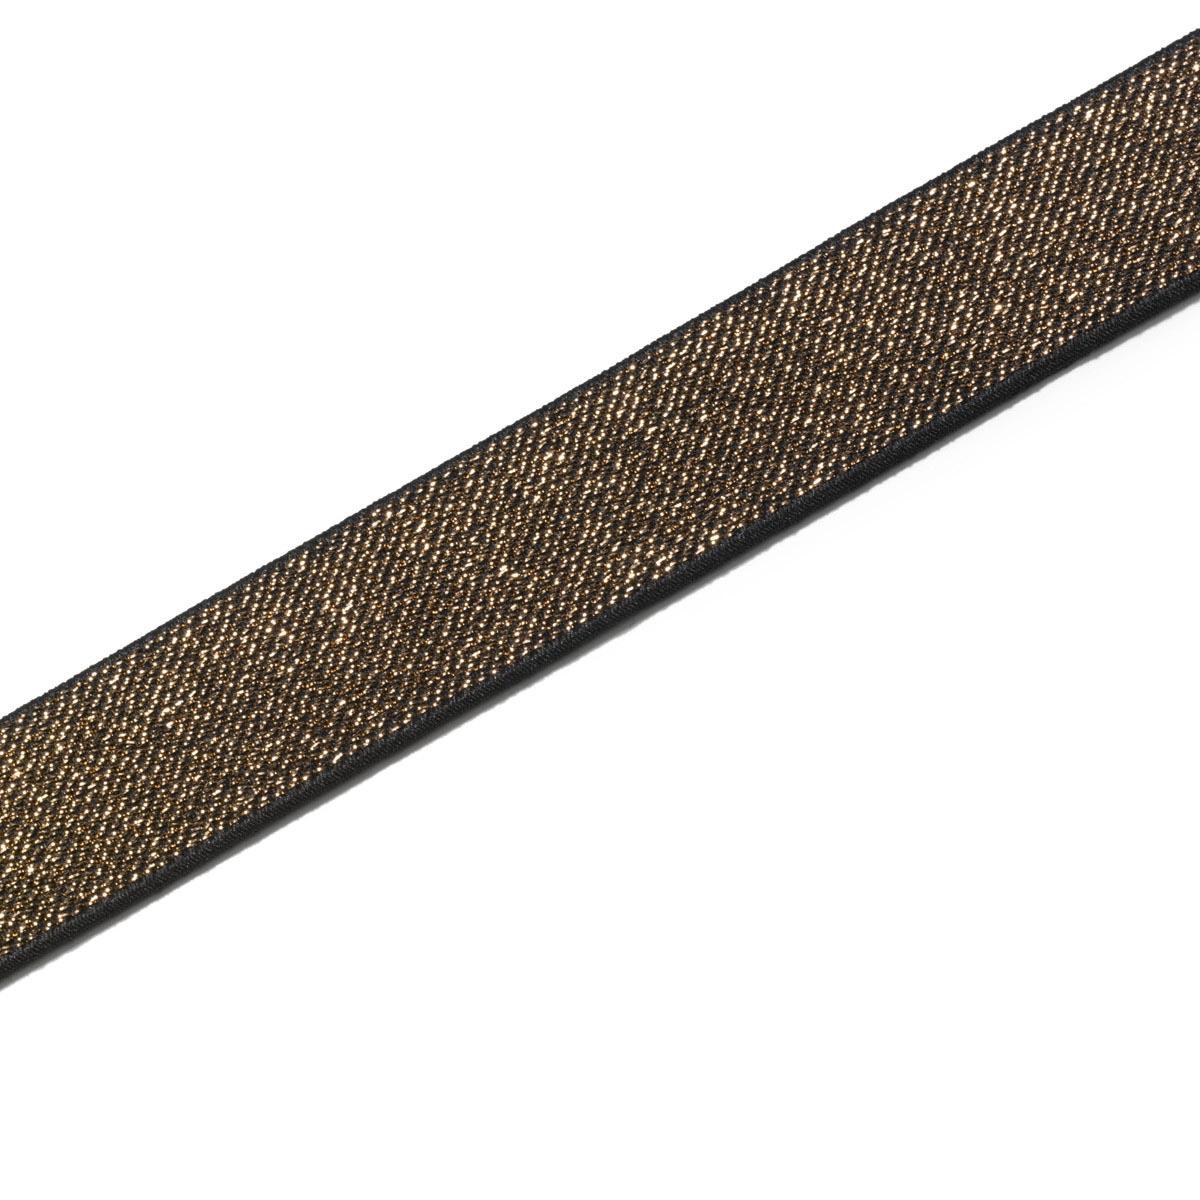 957468 Эластичная лента Color 25мм*7м, шоколад/золото